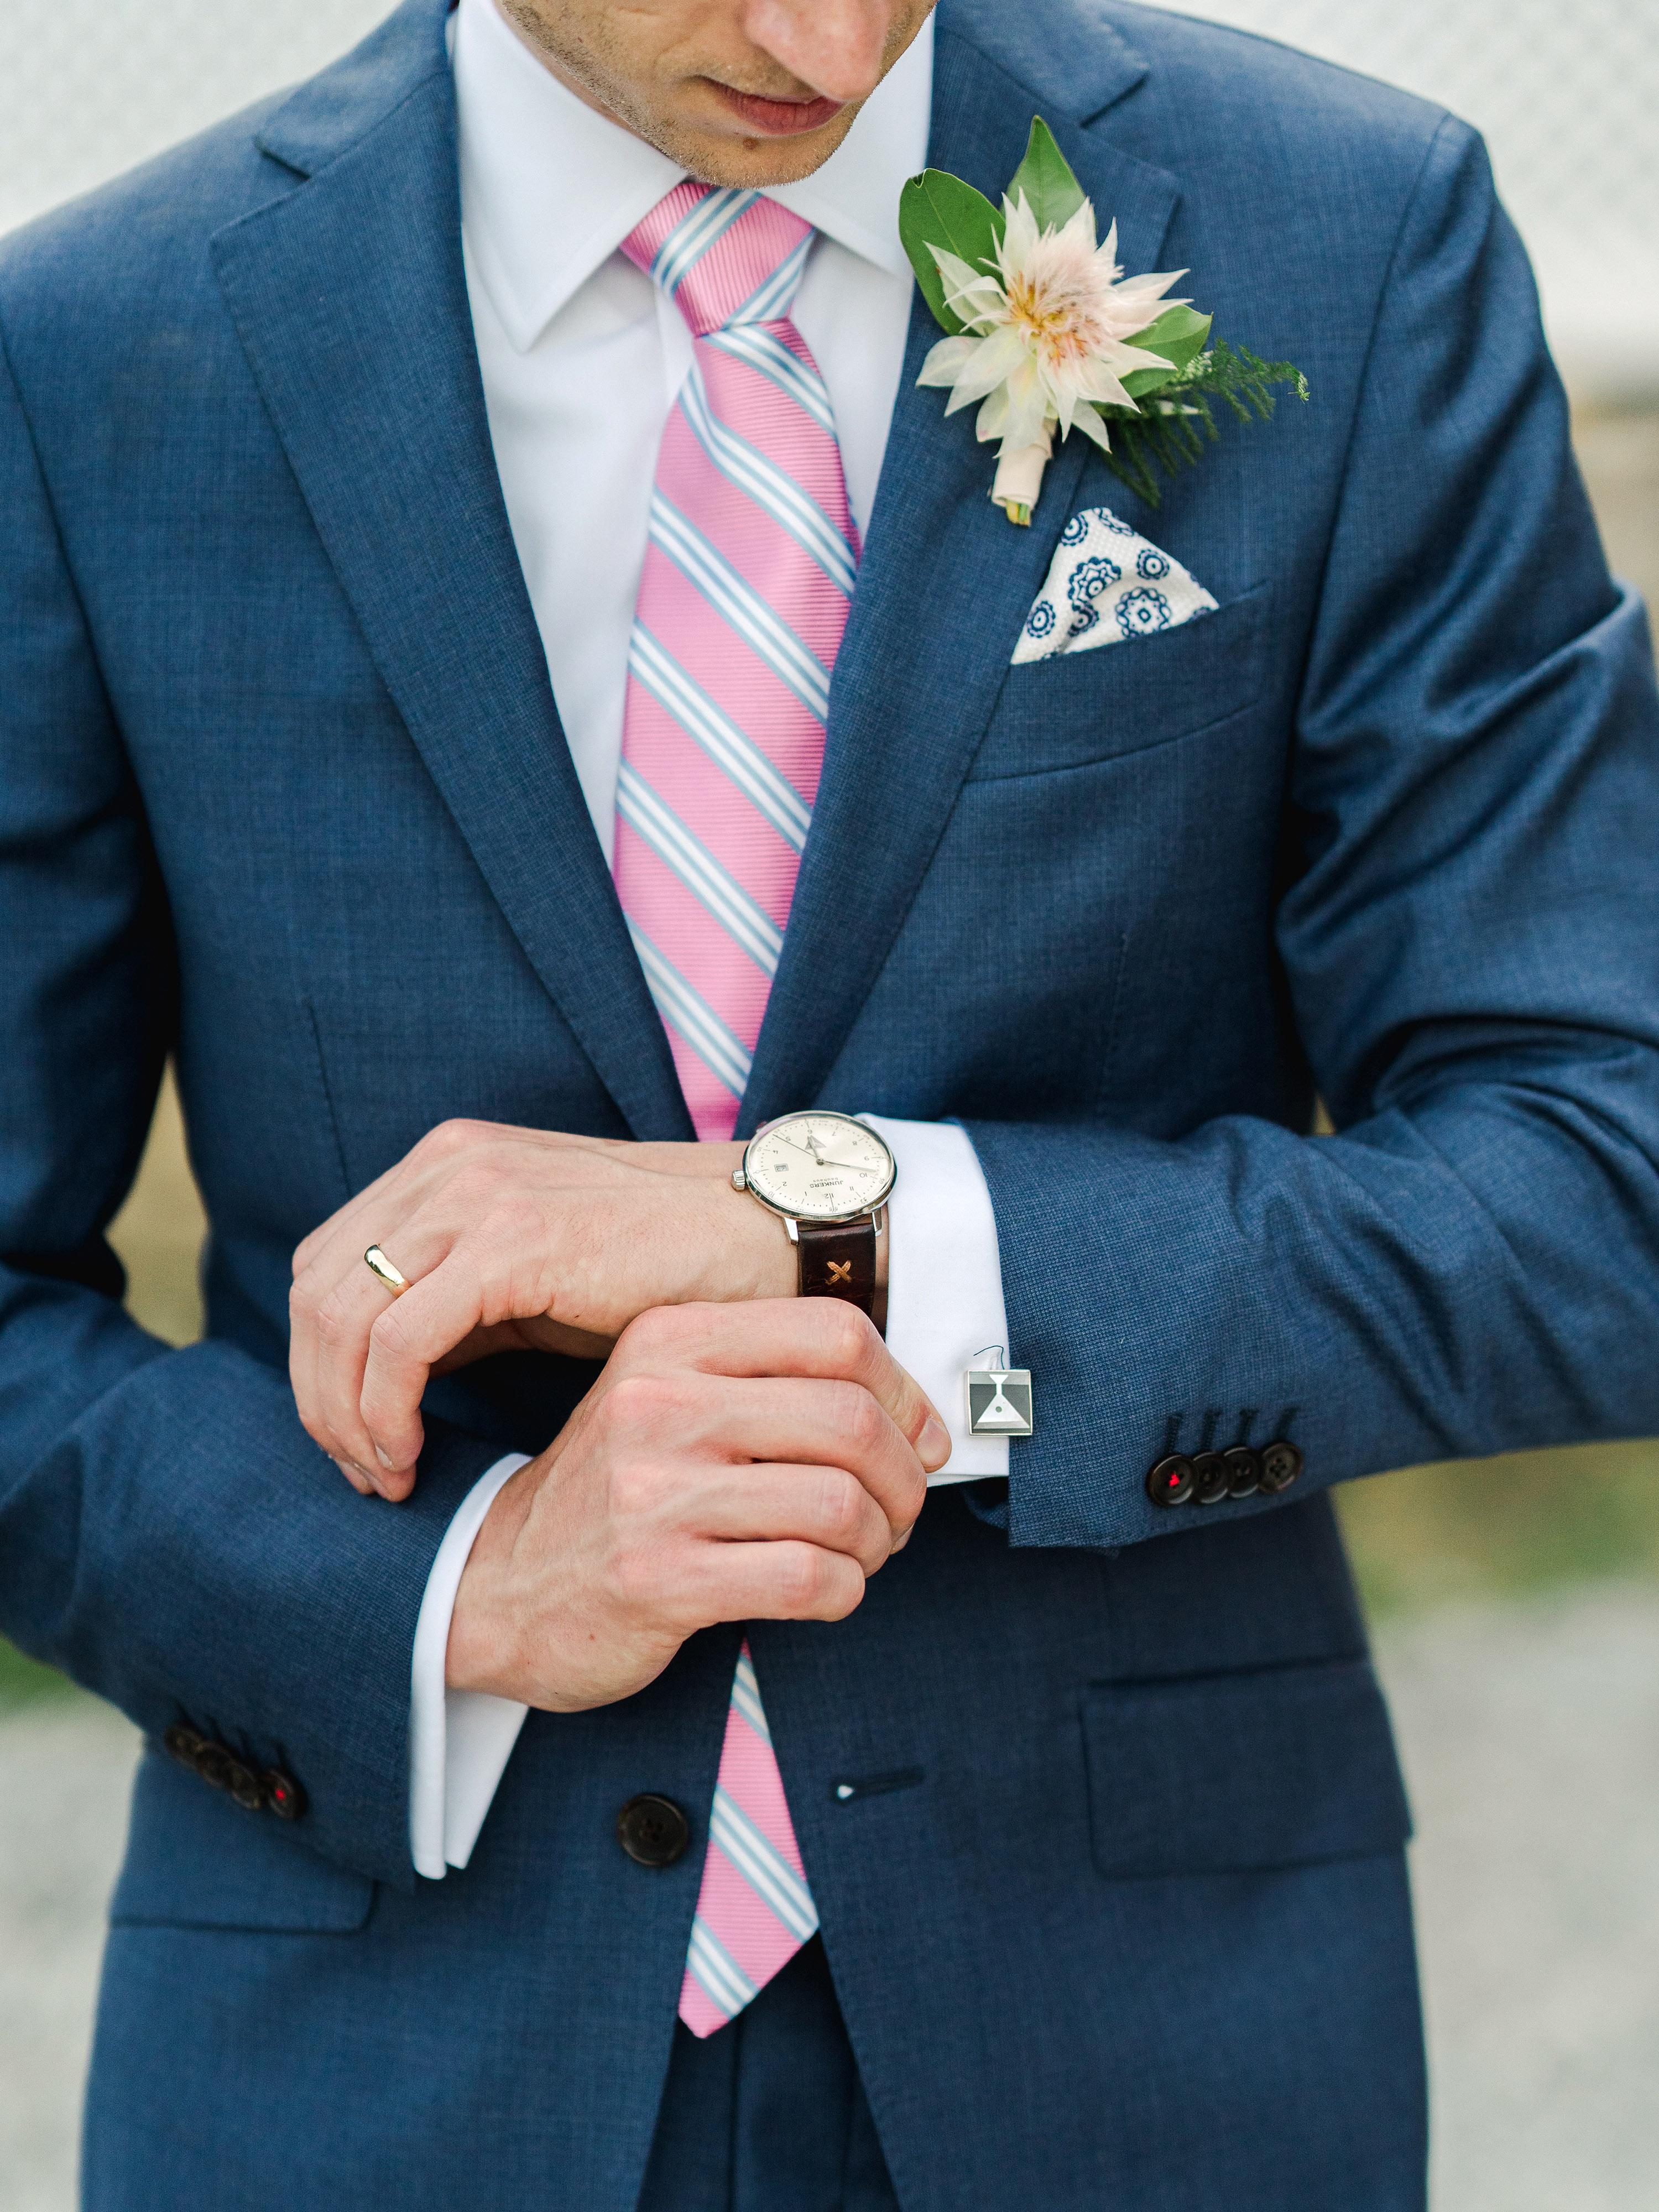 dayane collin wedding groom cuff links